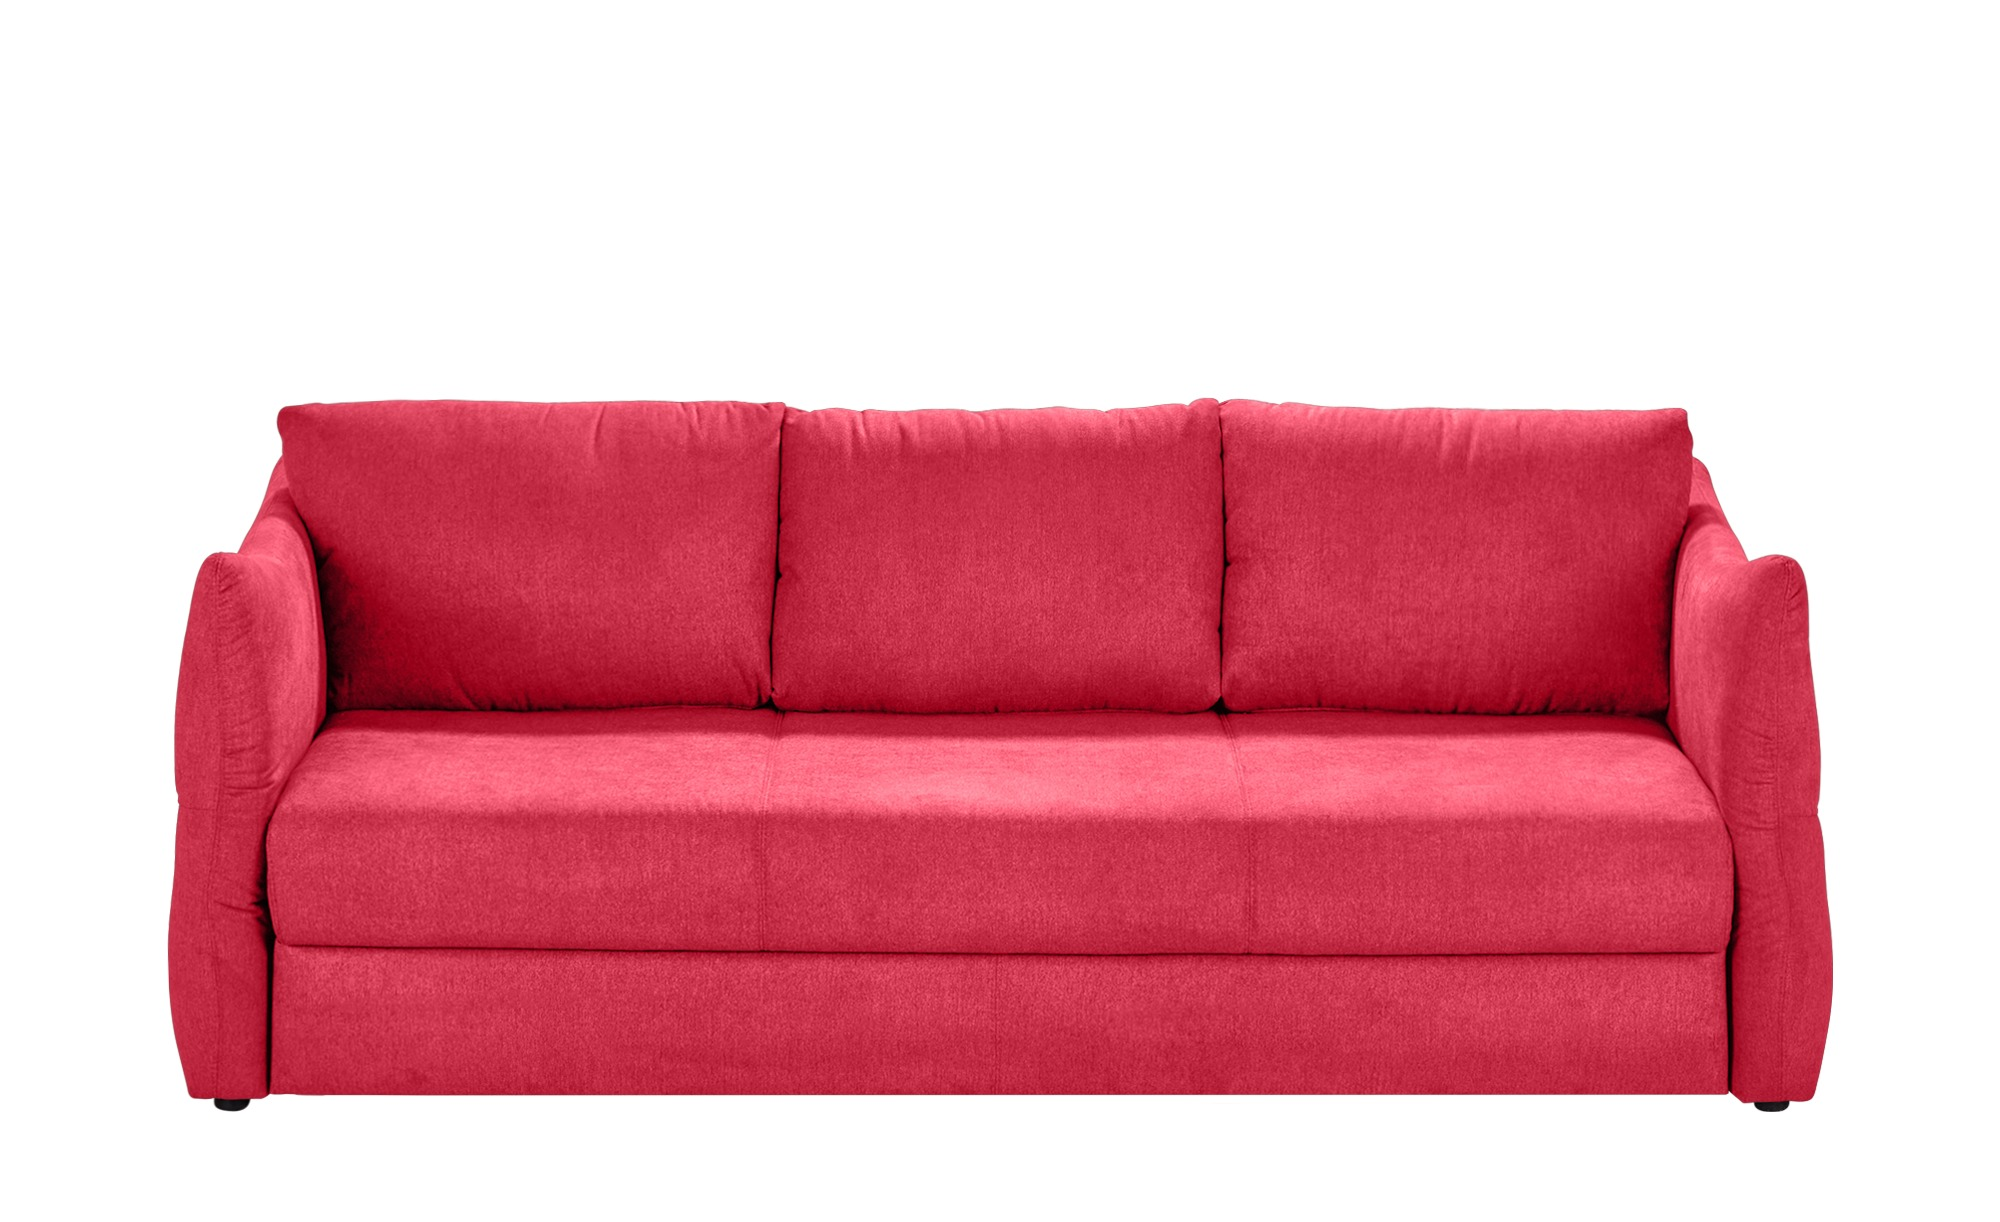 Smart Sofa 3 Sitzig Rot Webstoff Franziska Kunstleder Sofa Big Sofa Kaufen Und Sofa Design